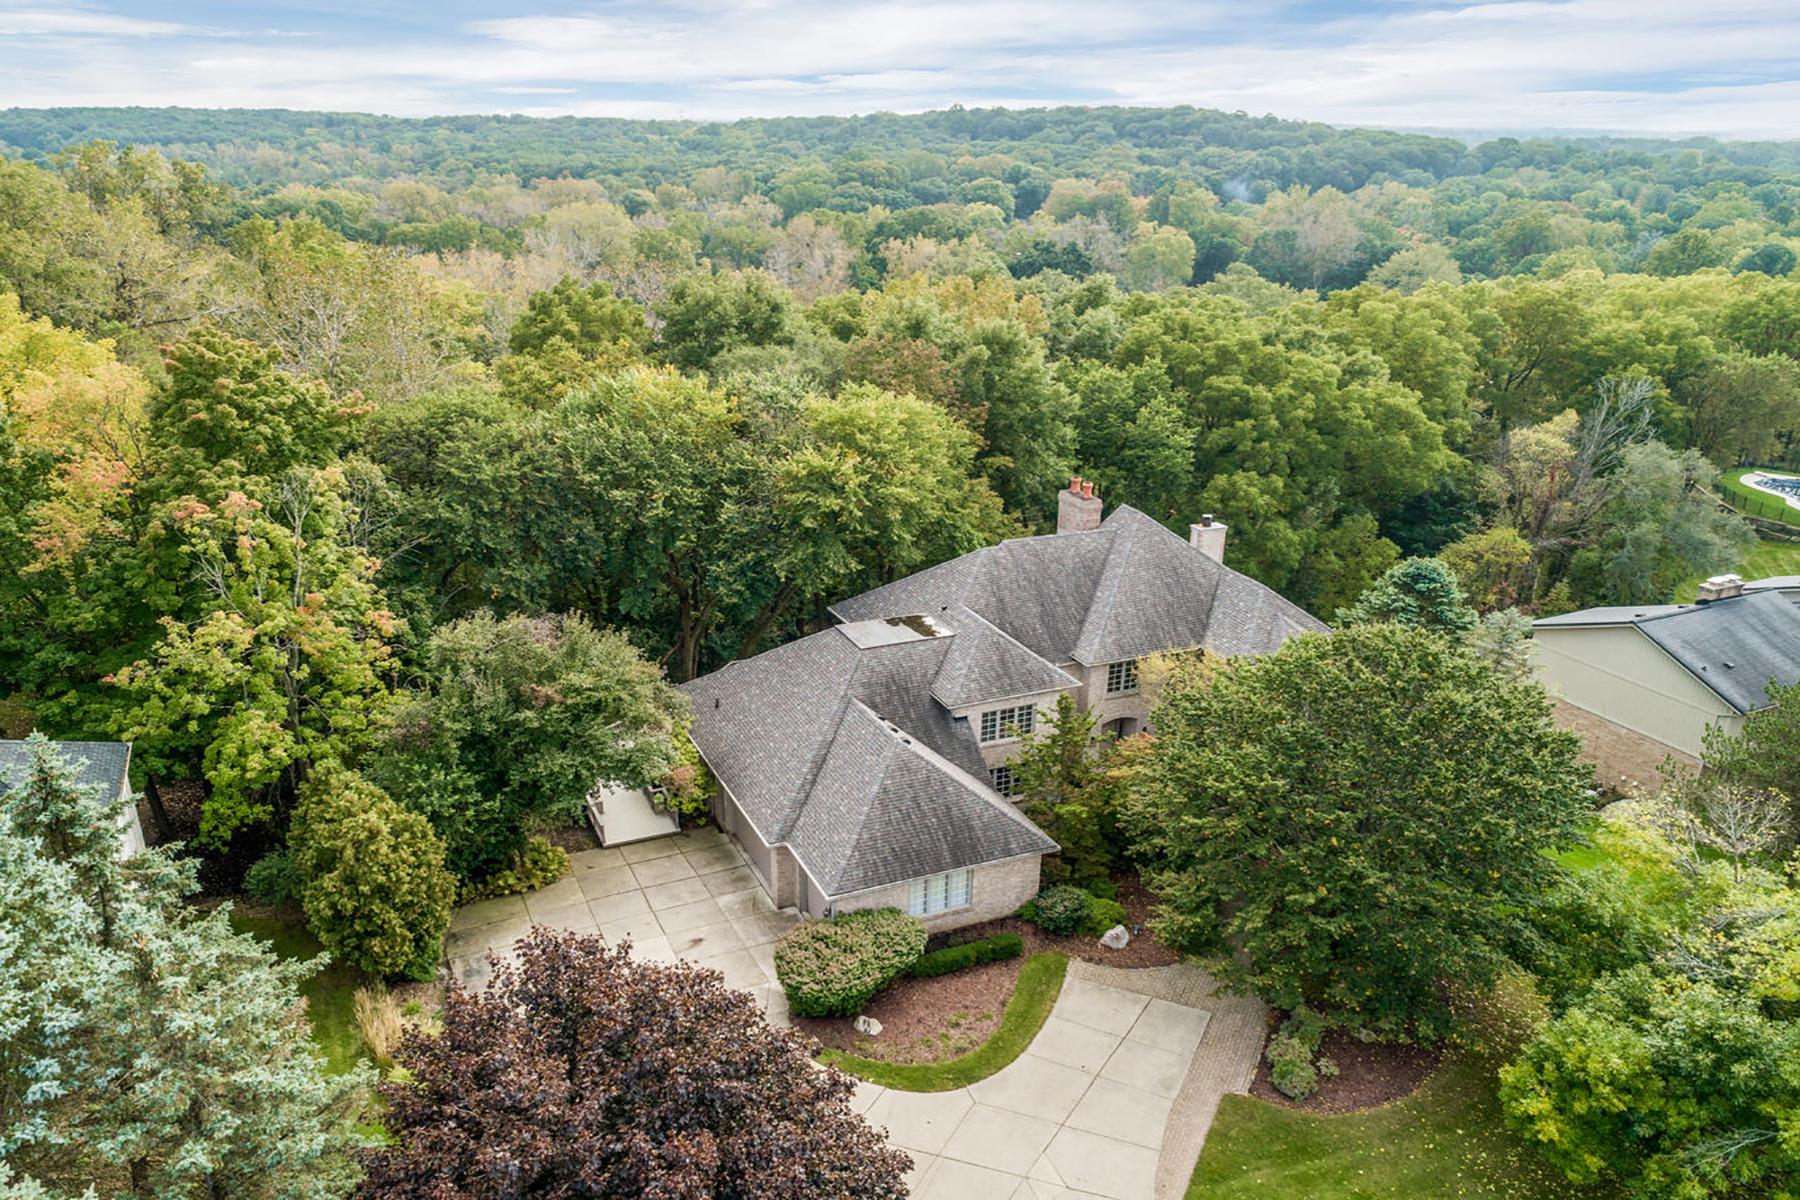 Single Family Homes for Sale at Farmington Hills 34231 Ramble Hills Farmington Hills, Michigan 48331 United States